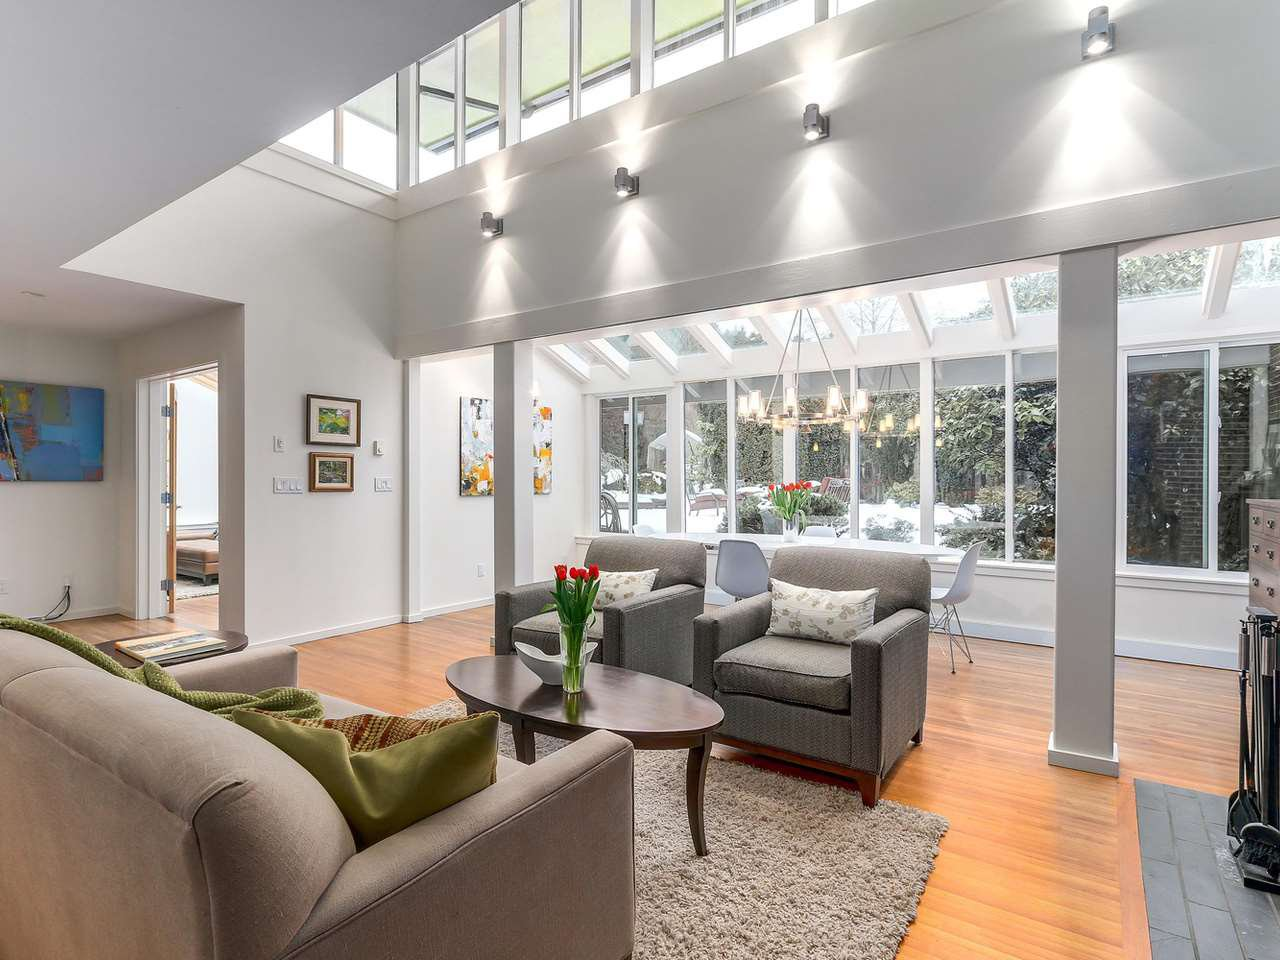 Photo 4: Photos: 3708 EDGEMONT Boulevard in North Vancouver: Edgemont House Fourplex for sale : MLS®# R2138514